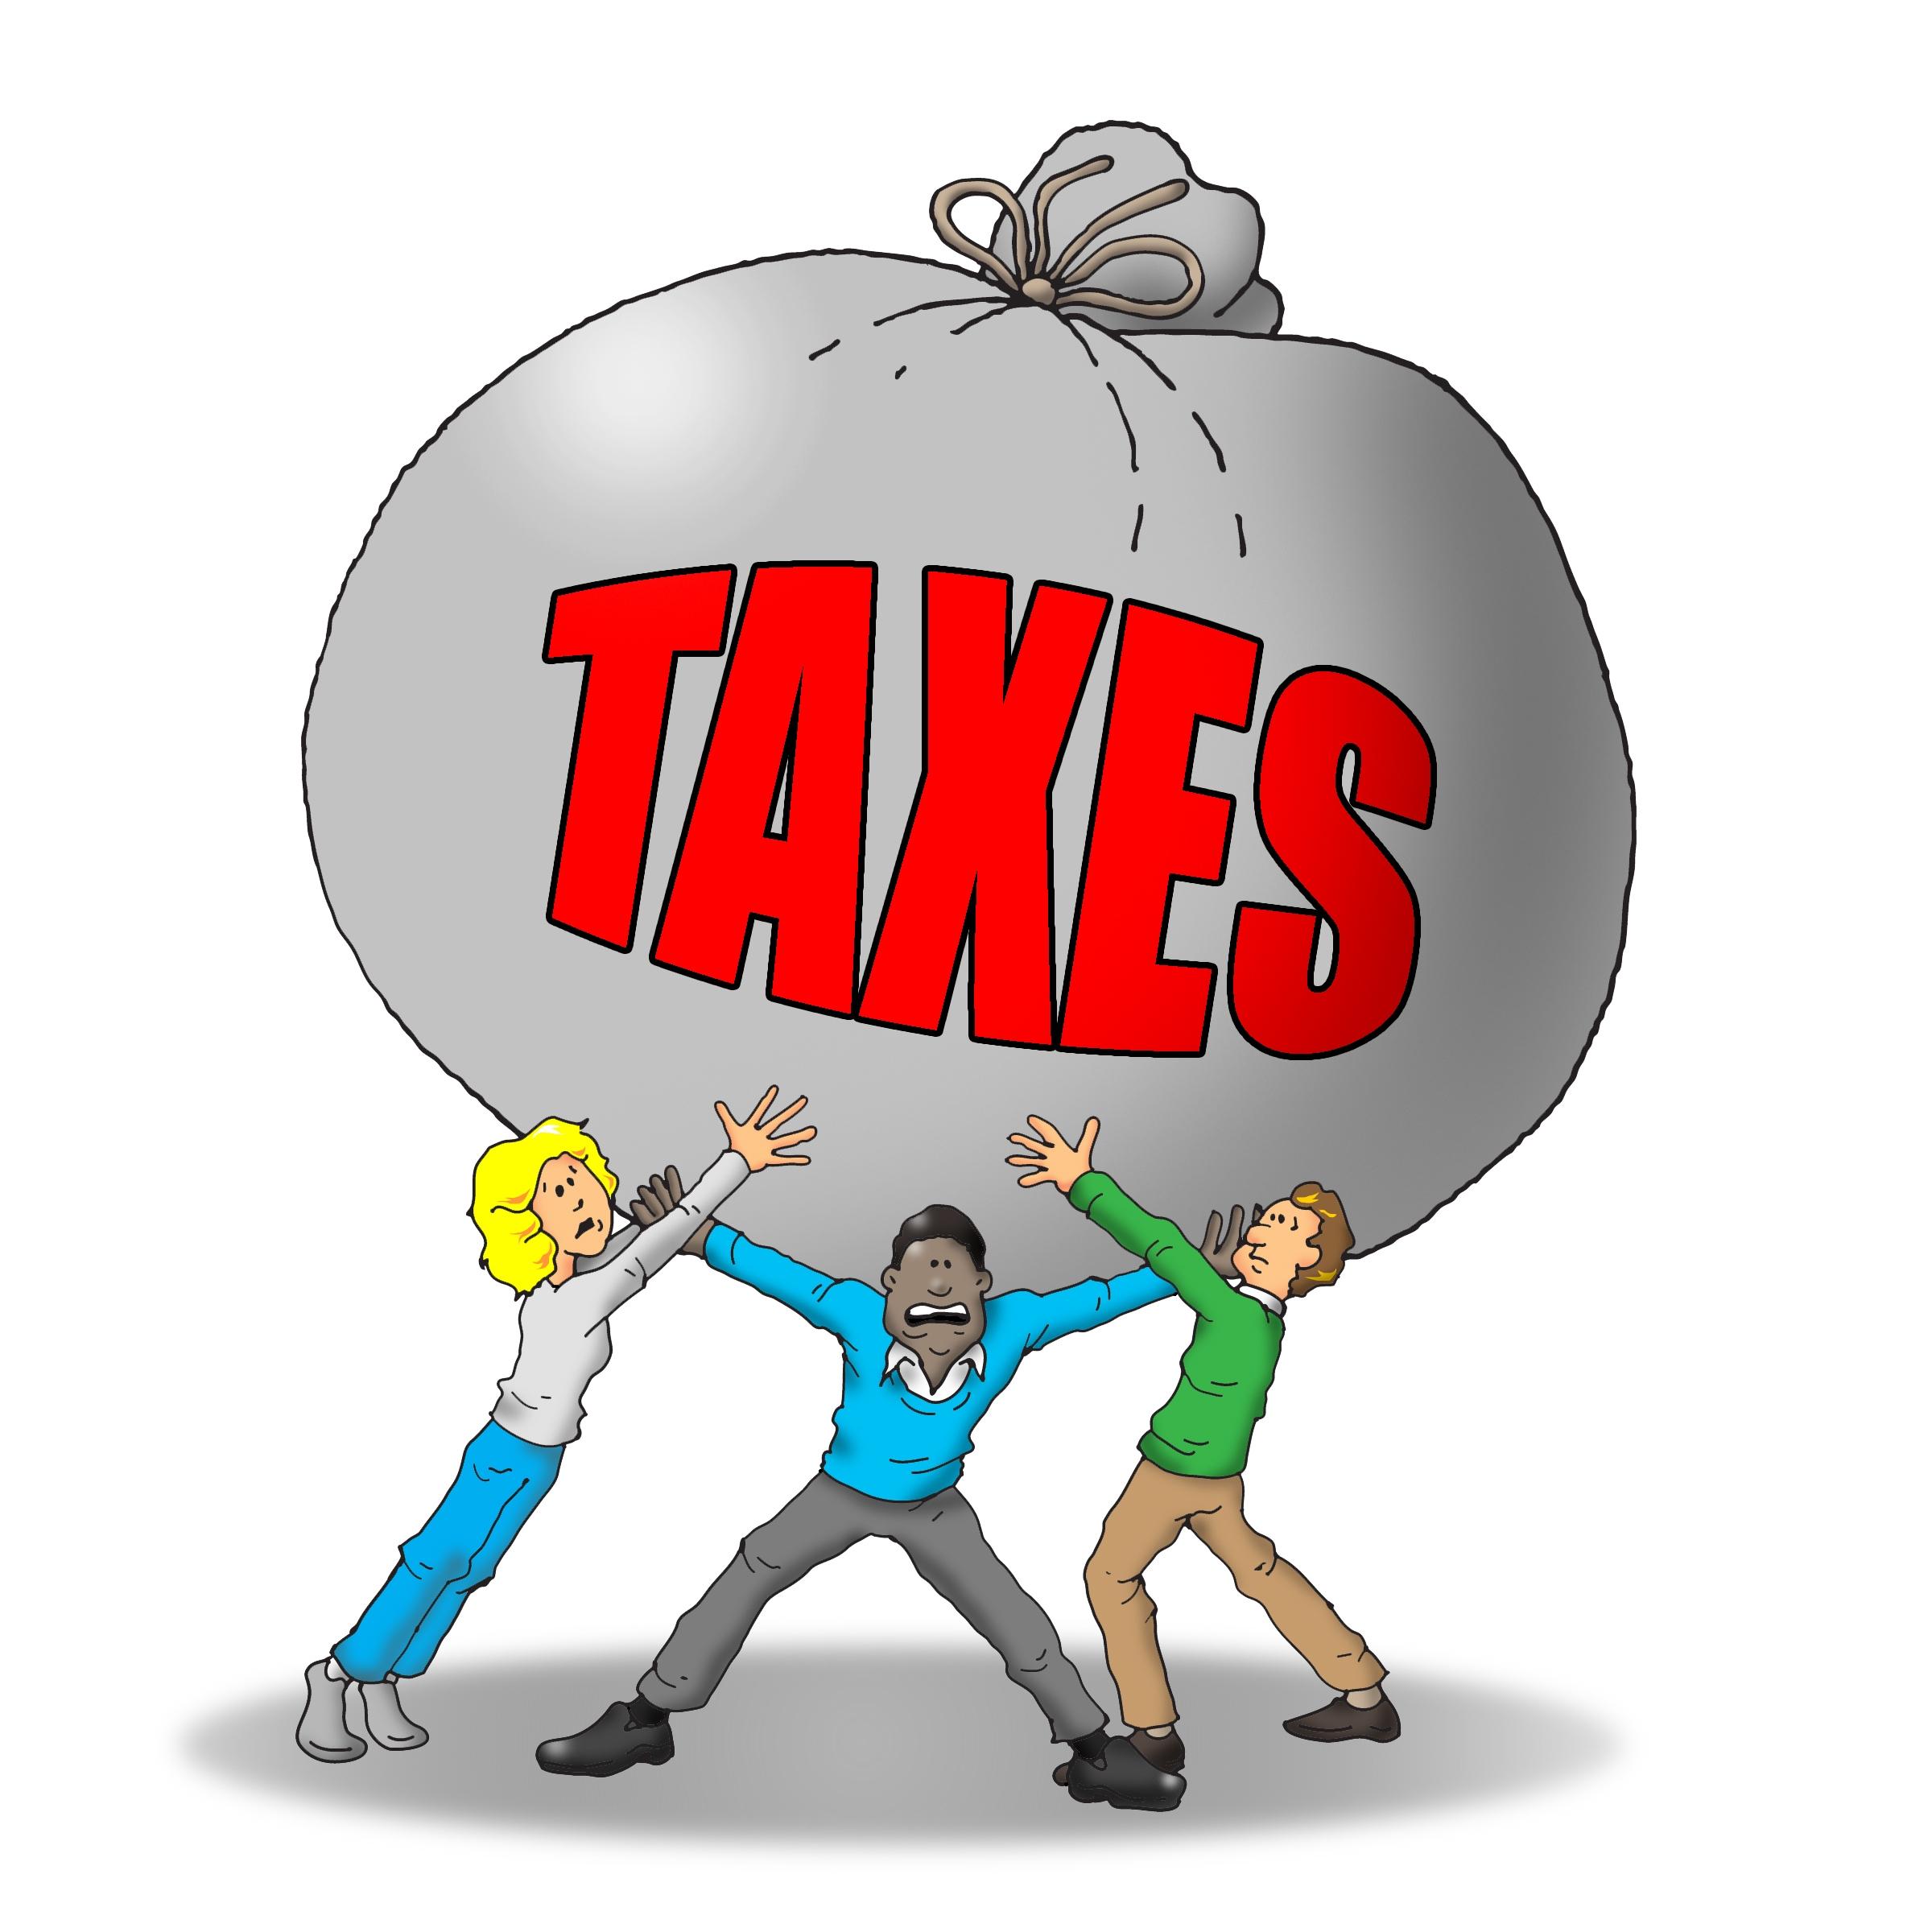 sunk-under-taxes